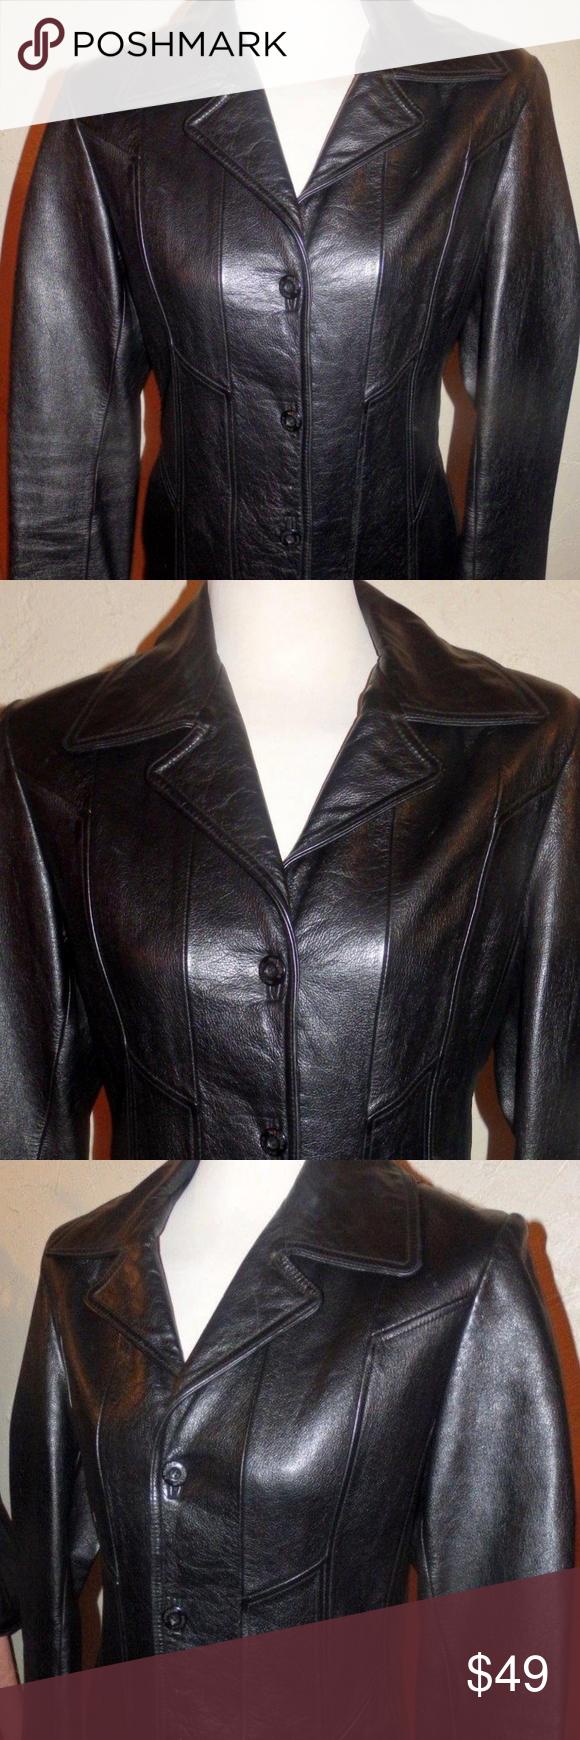 Wilsons Maxima Black Heavy Leather Jacket Sz M Leather